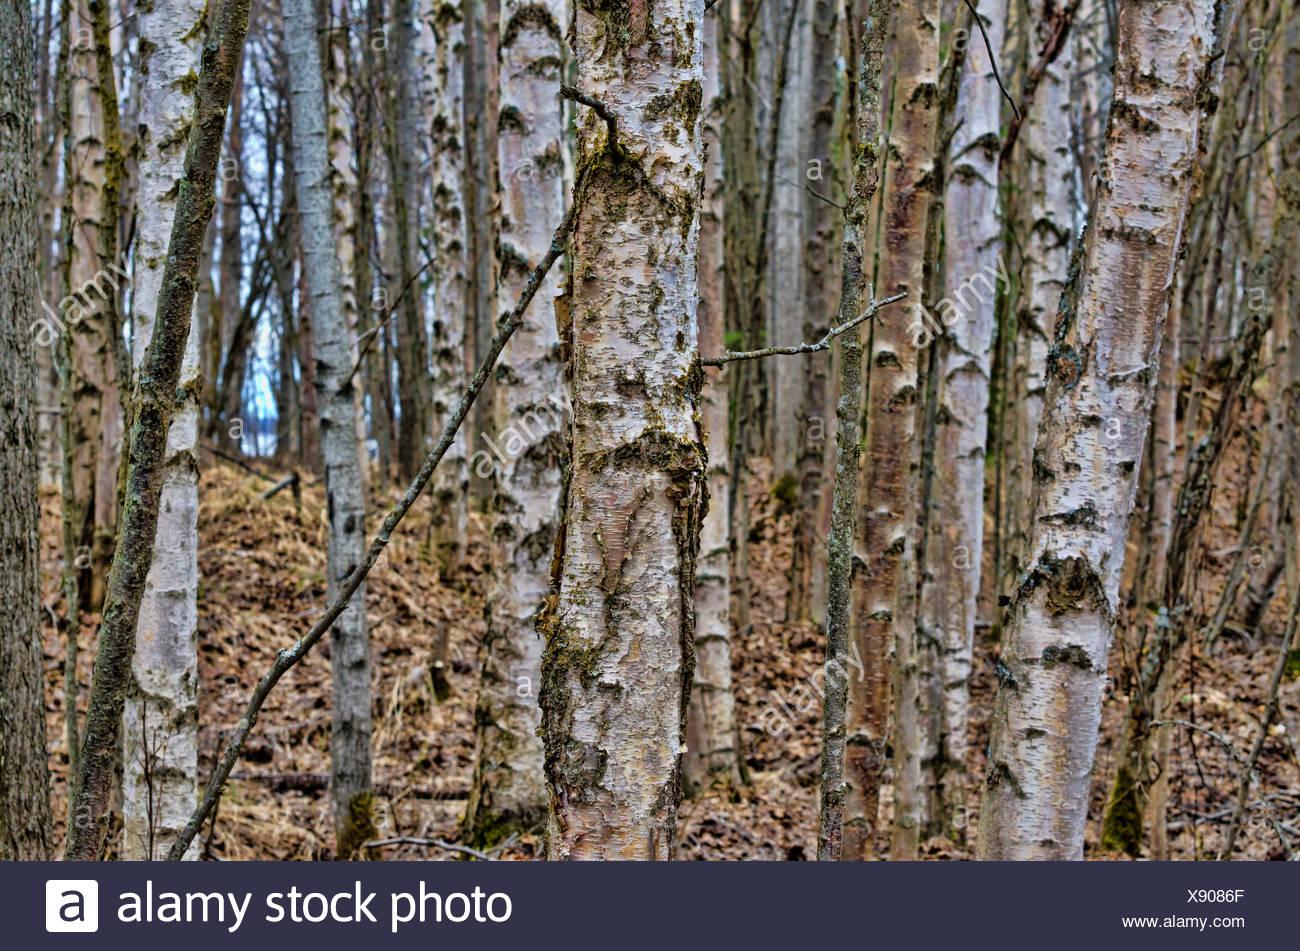 birch trees, Yukon, Canada, forest, autumn, nature - Stock Image